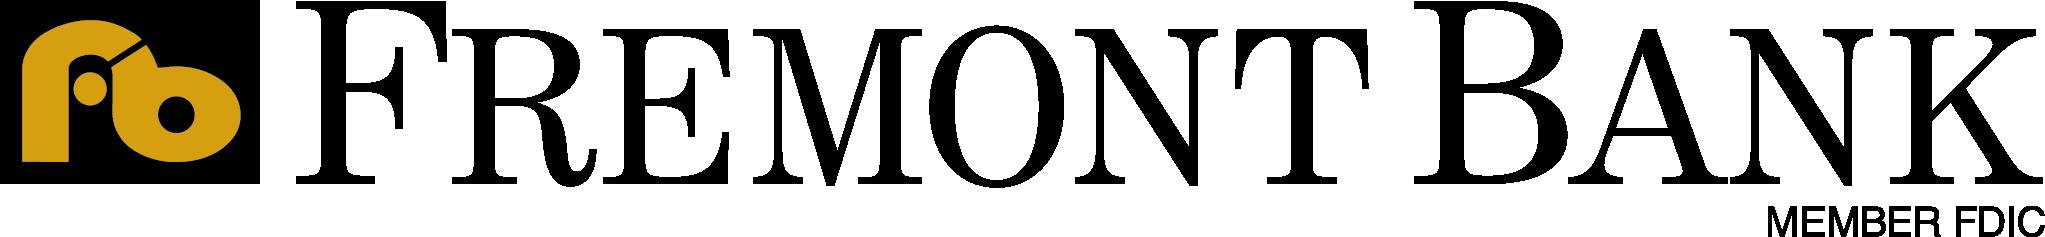 Fremont Bank Company Logo